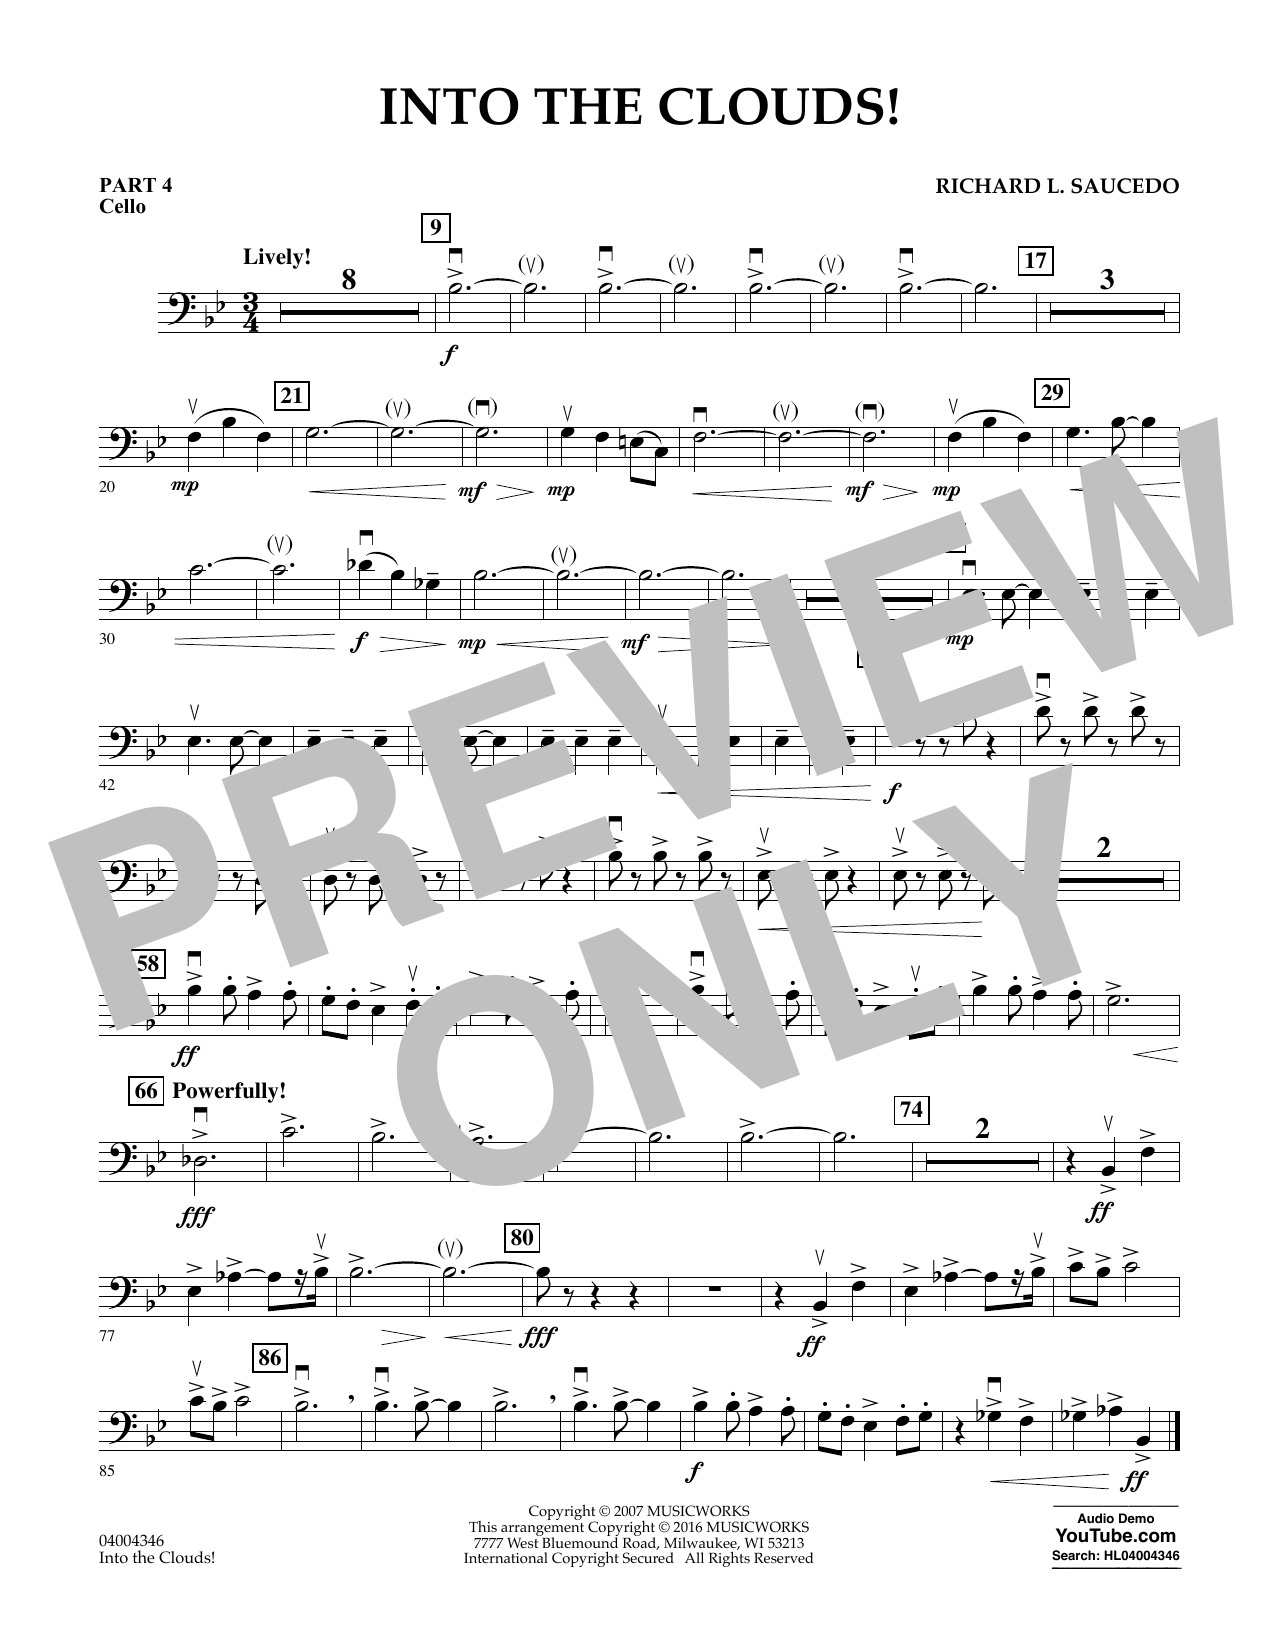 Into the Clouds! - Pt.4 - Cello (Flex-Band)